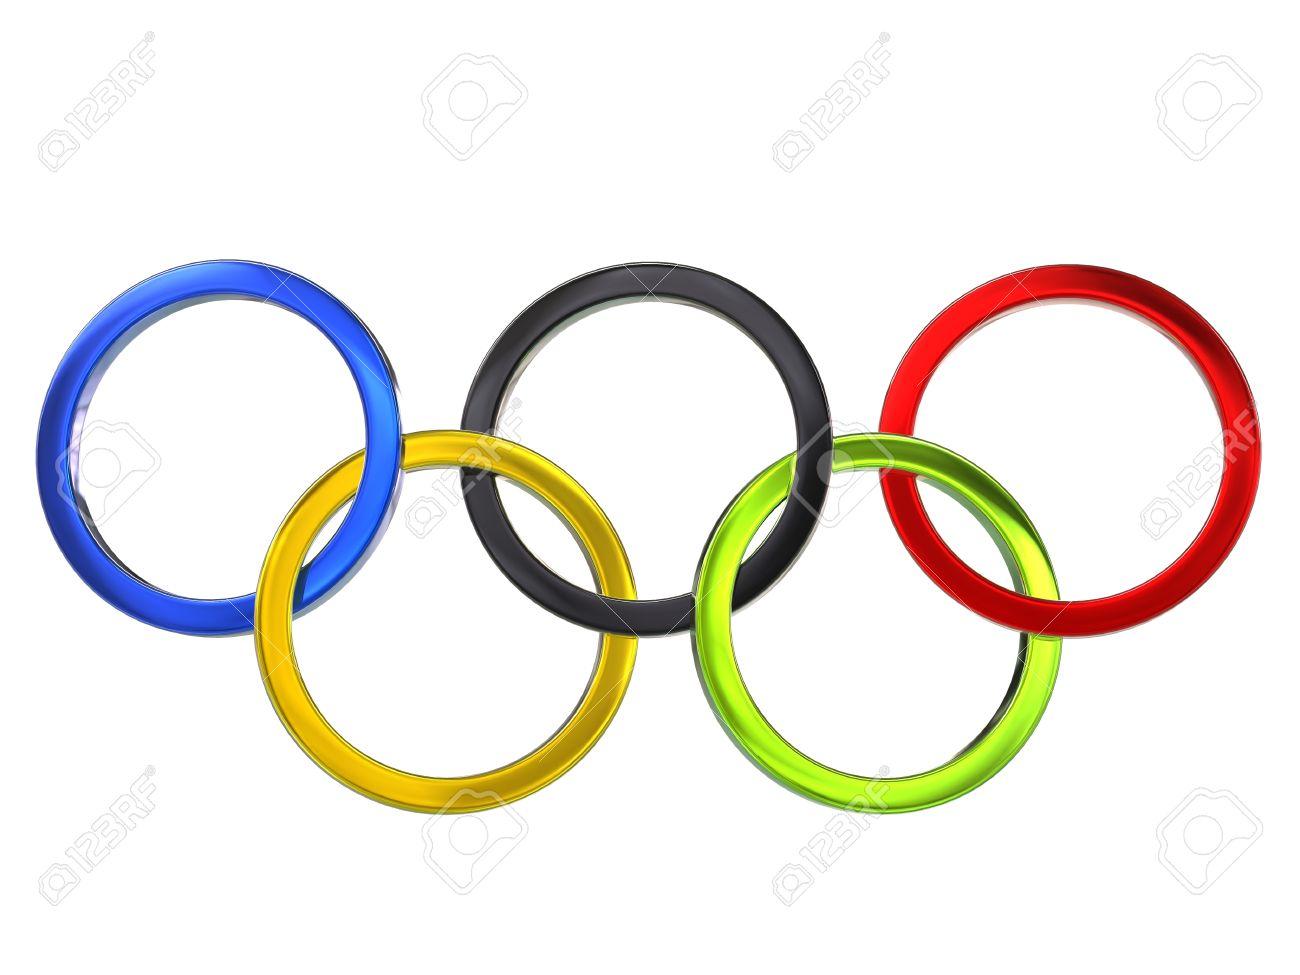 Olympic flame - Wikipedia]